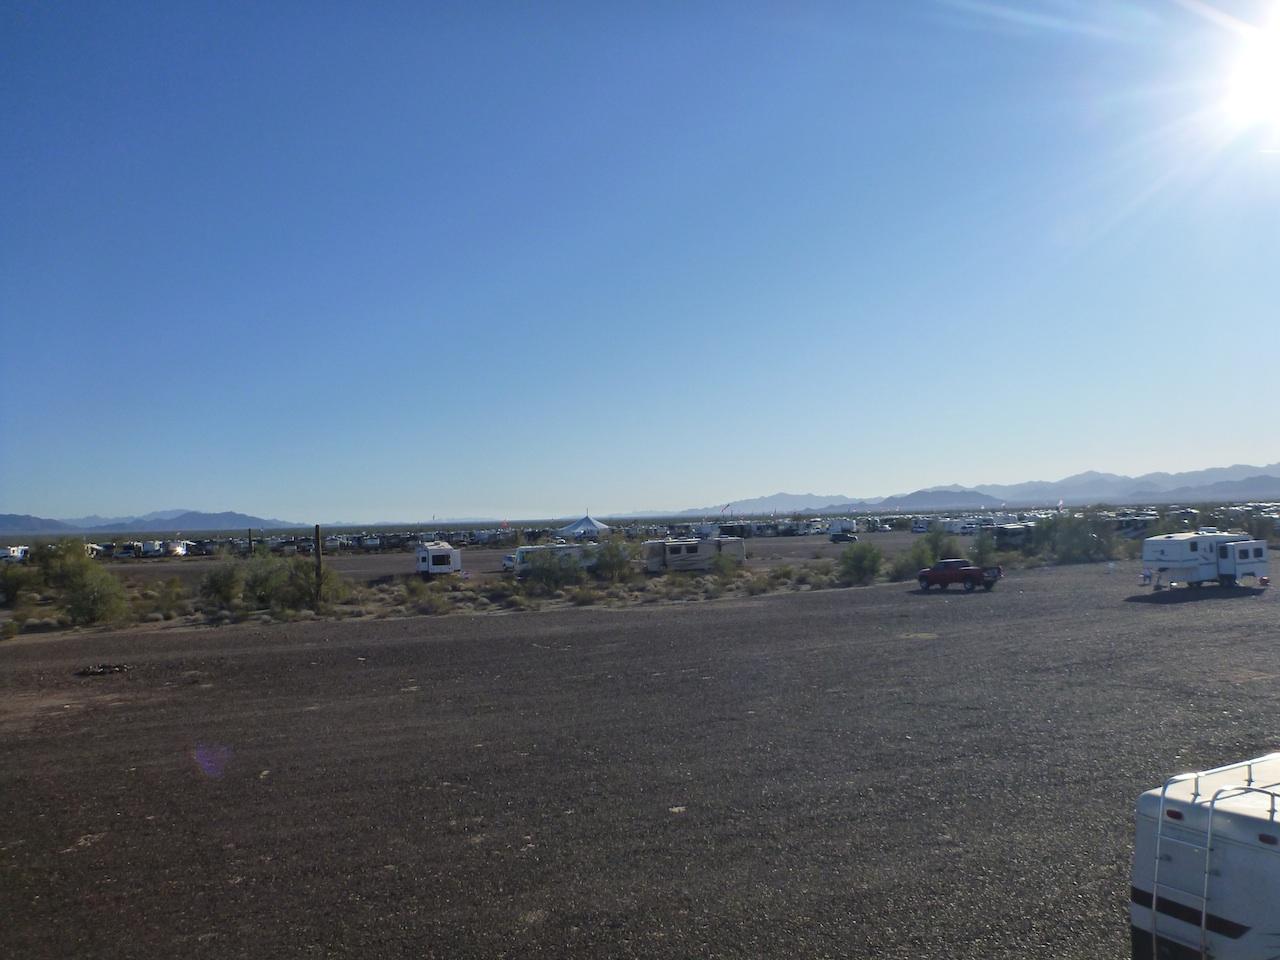 All The RVers On The BLM Land Around Quartzsite, AZ